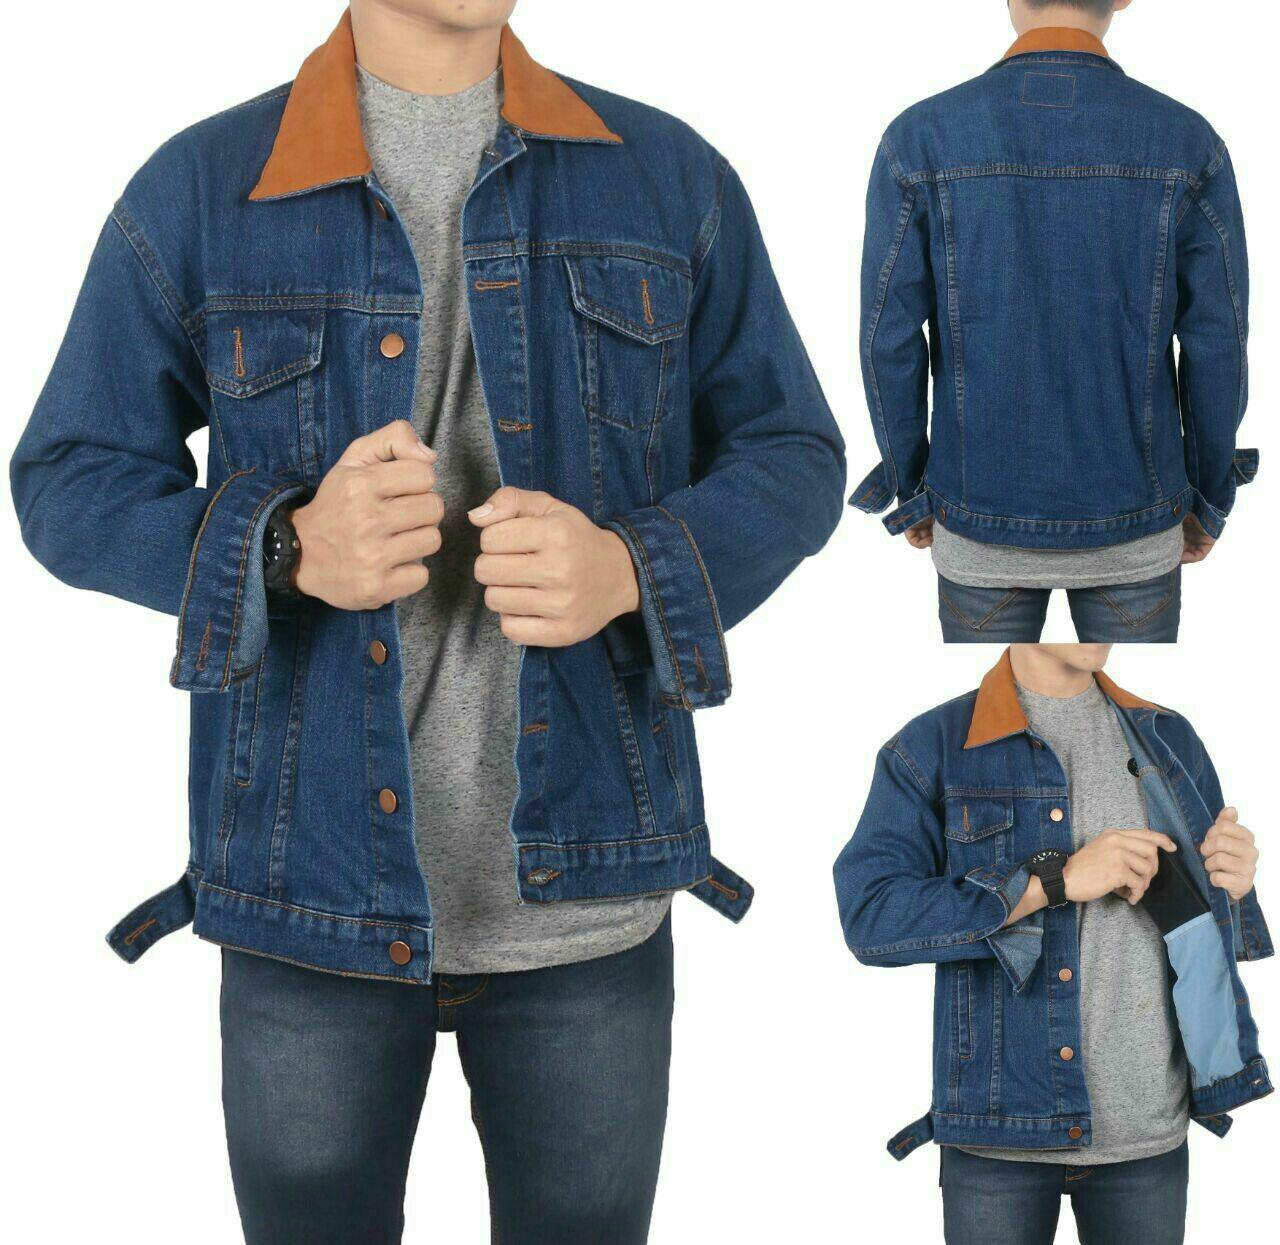 DNA Jaket Dilan / Jaket Jeans Dilan / Jaket Jeans Pria